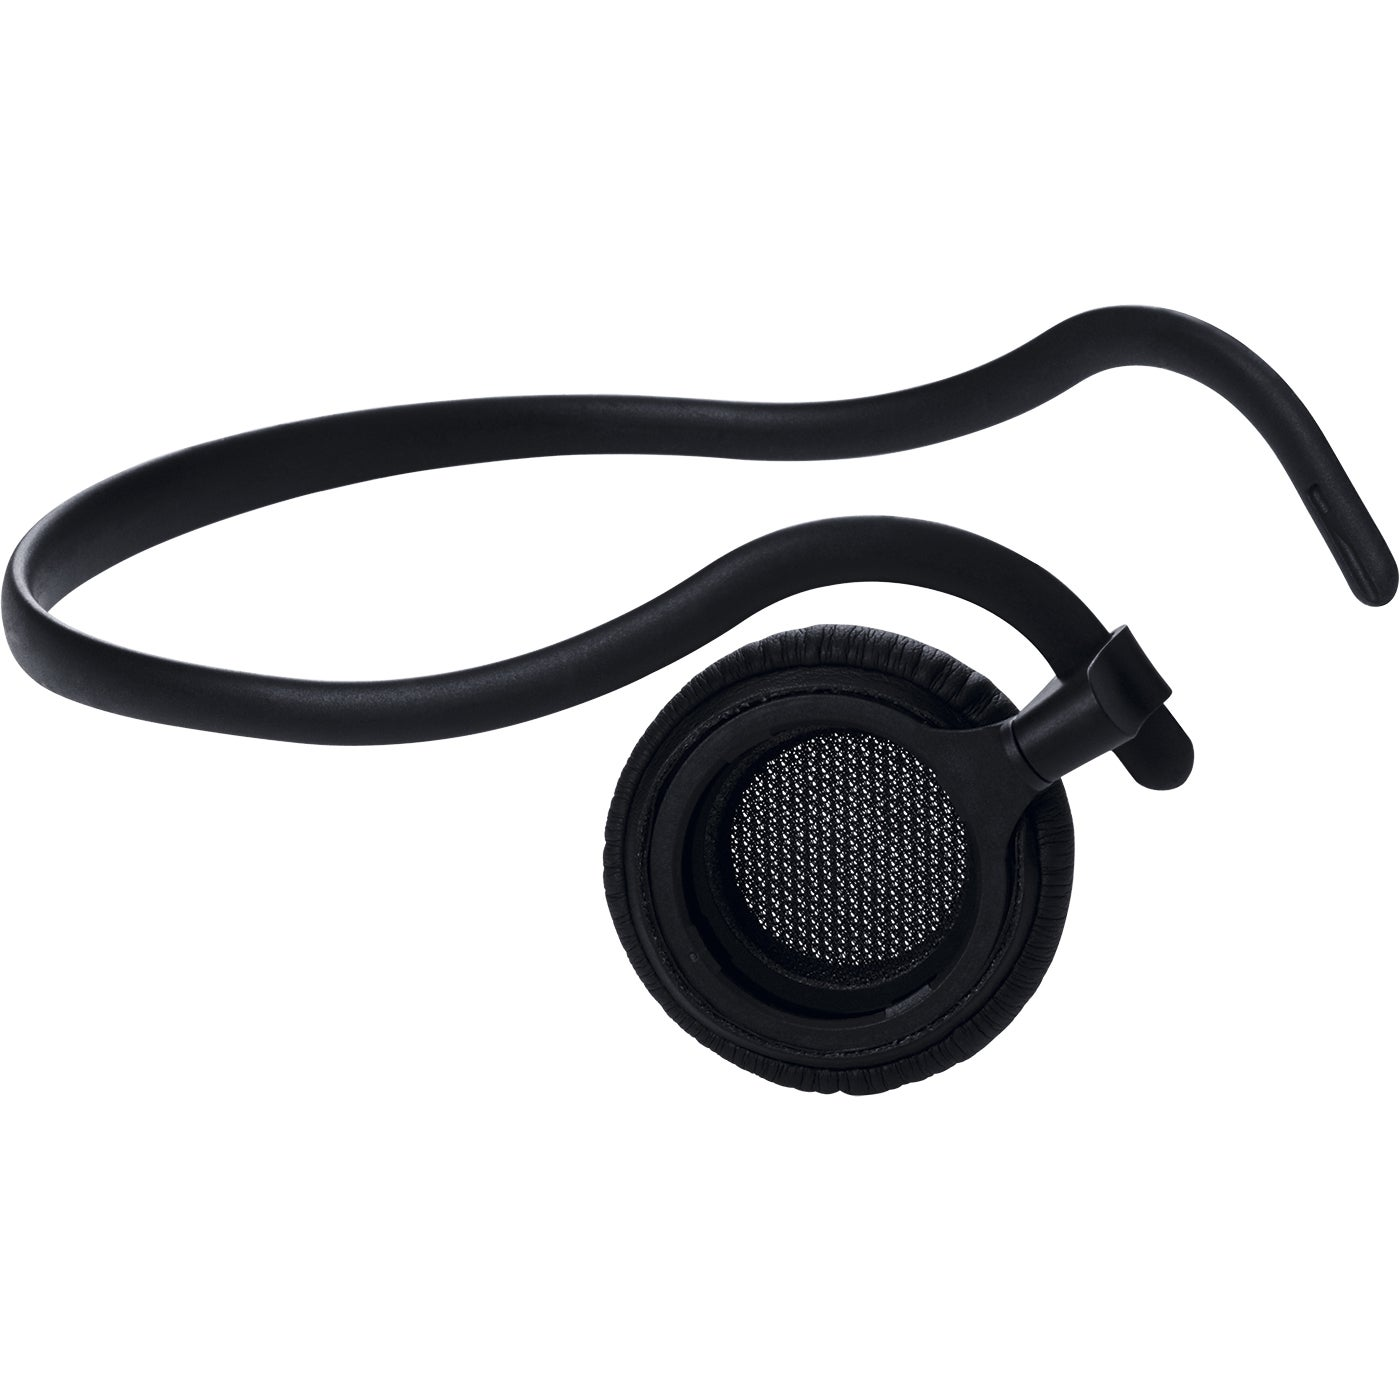 Jabra 14121-24 headphone/headset accessory Neckband